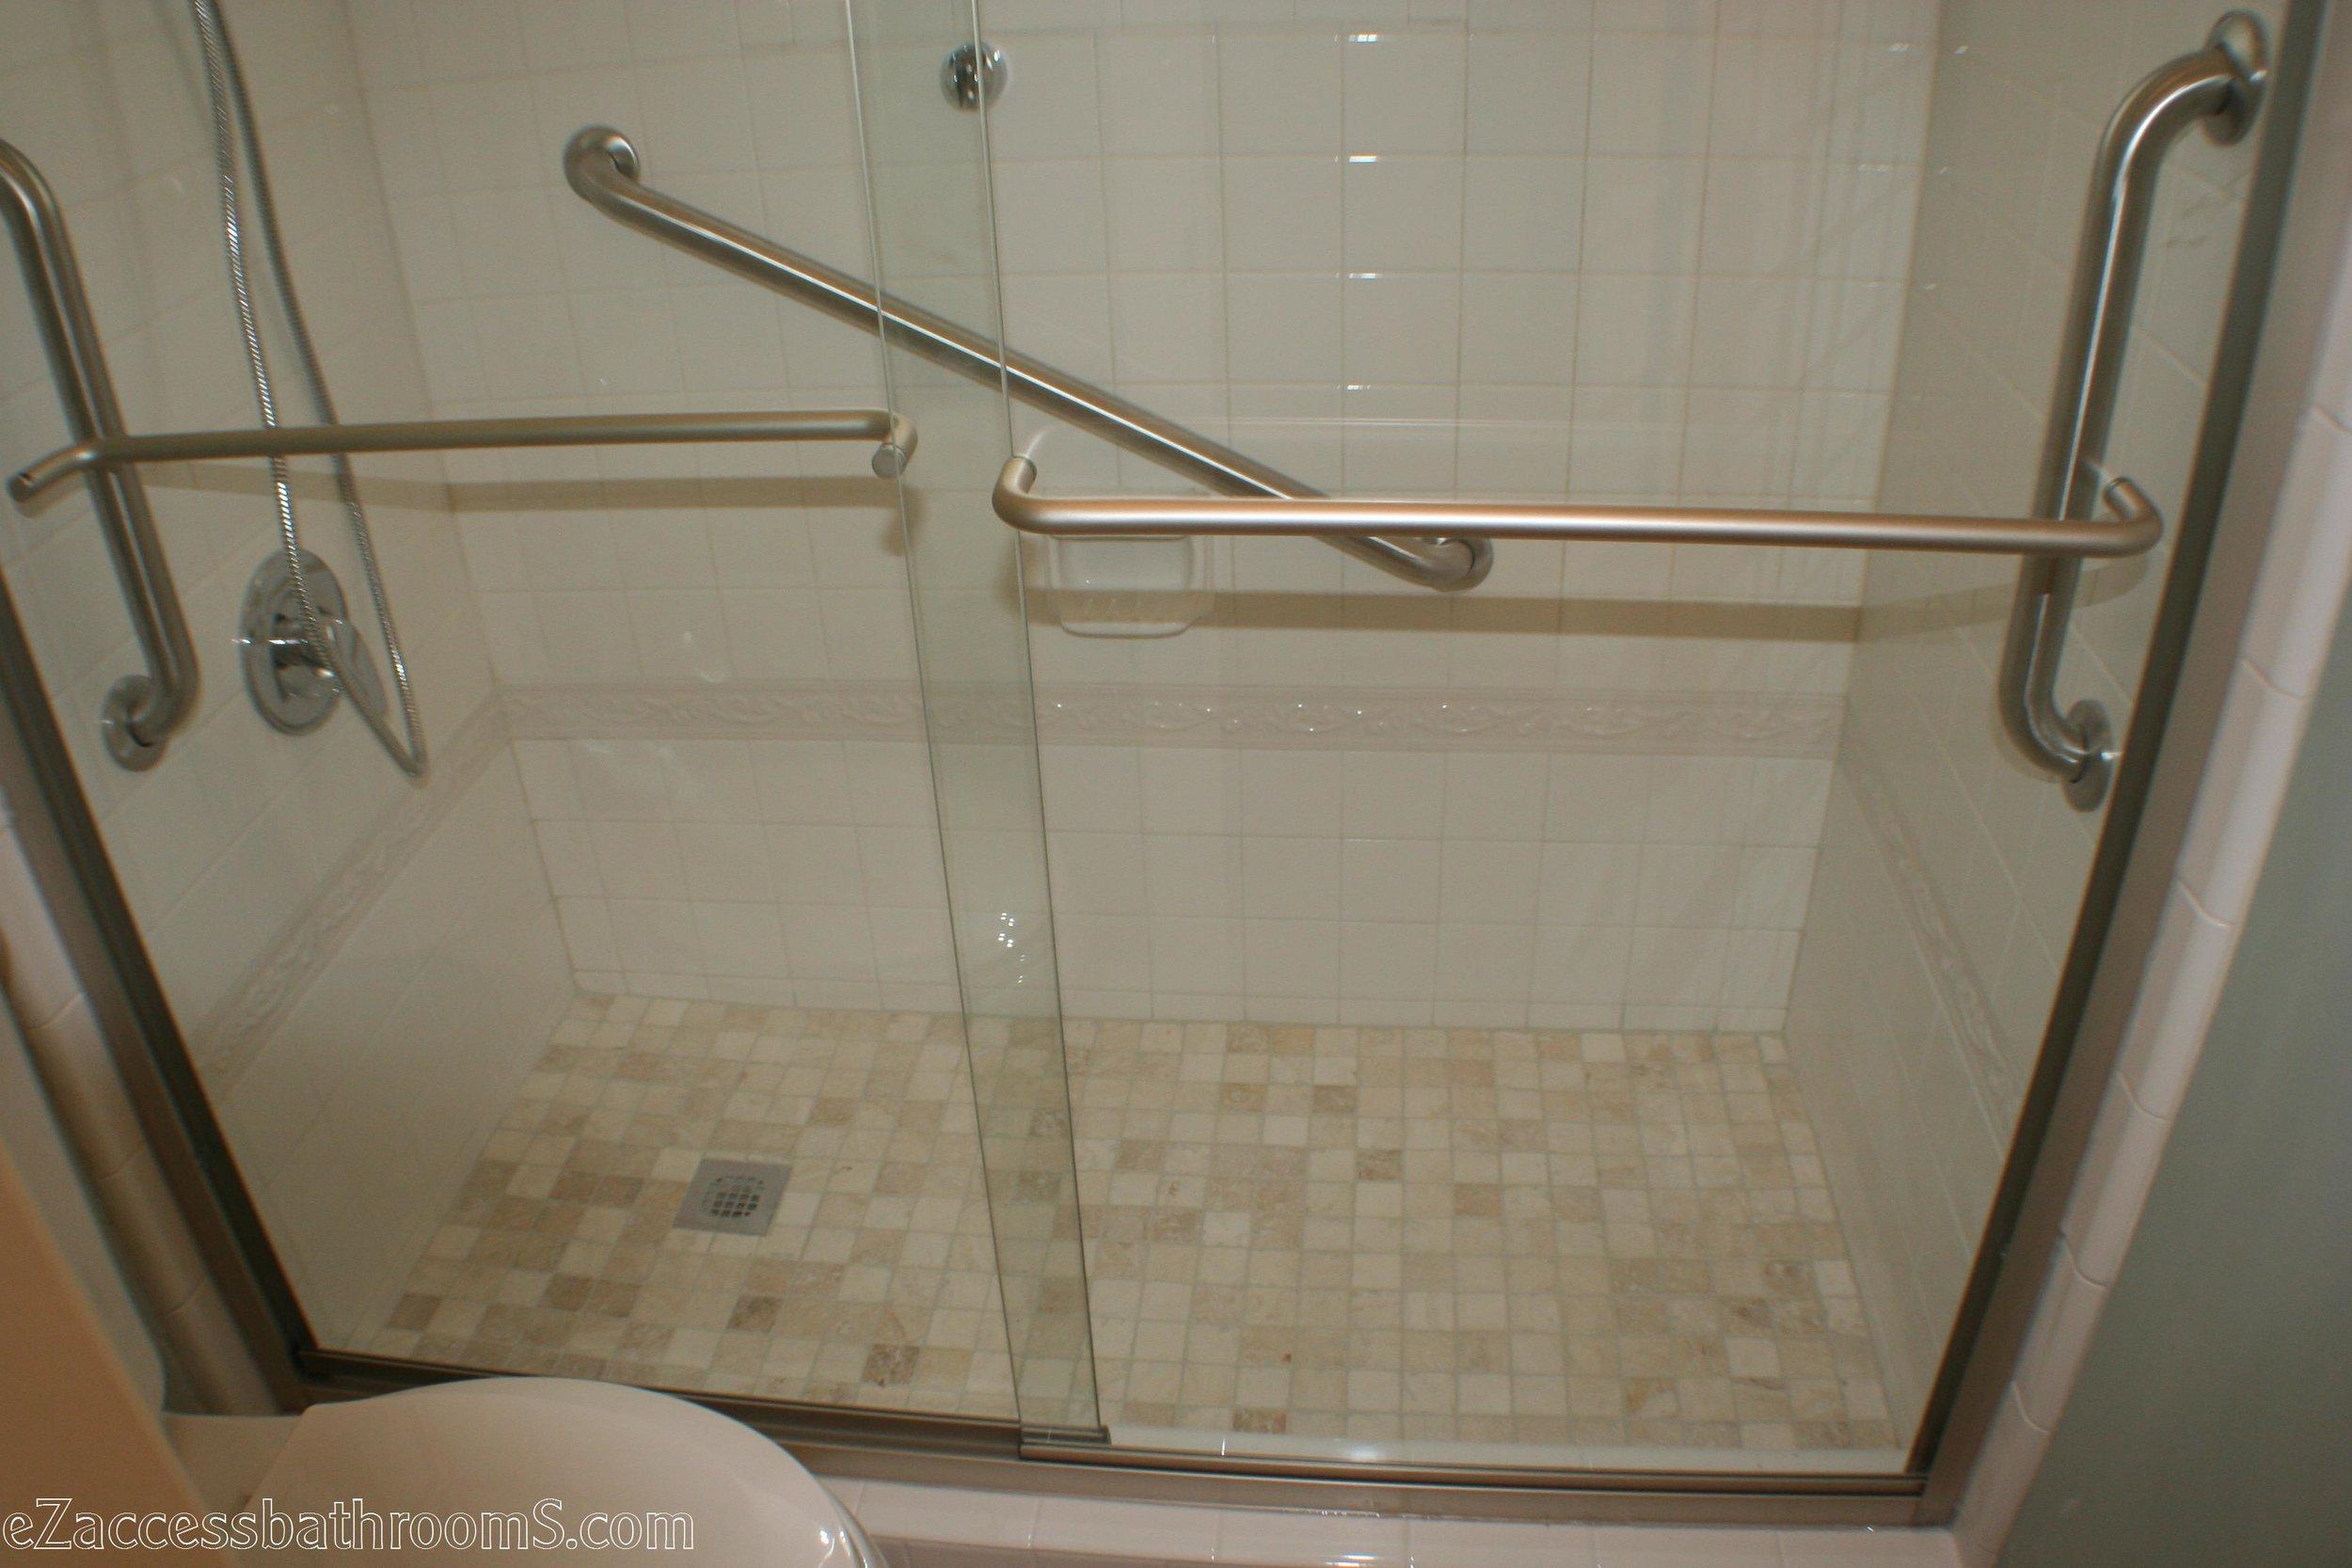 Budget tub to shower conversion ezaccessbathrooms.com 8322028473 010.JPG